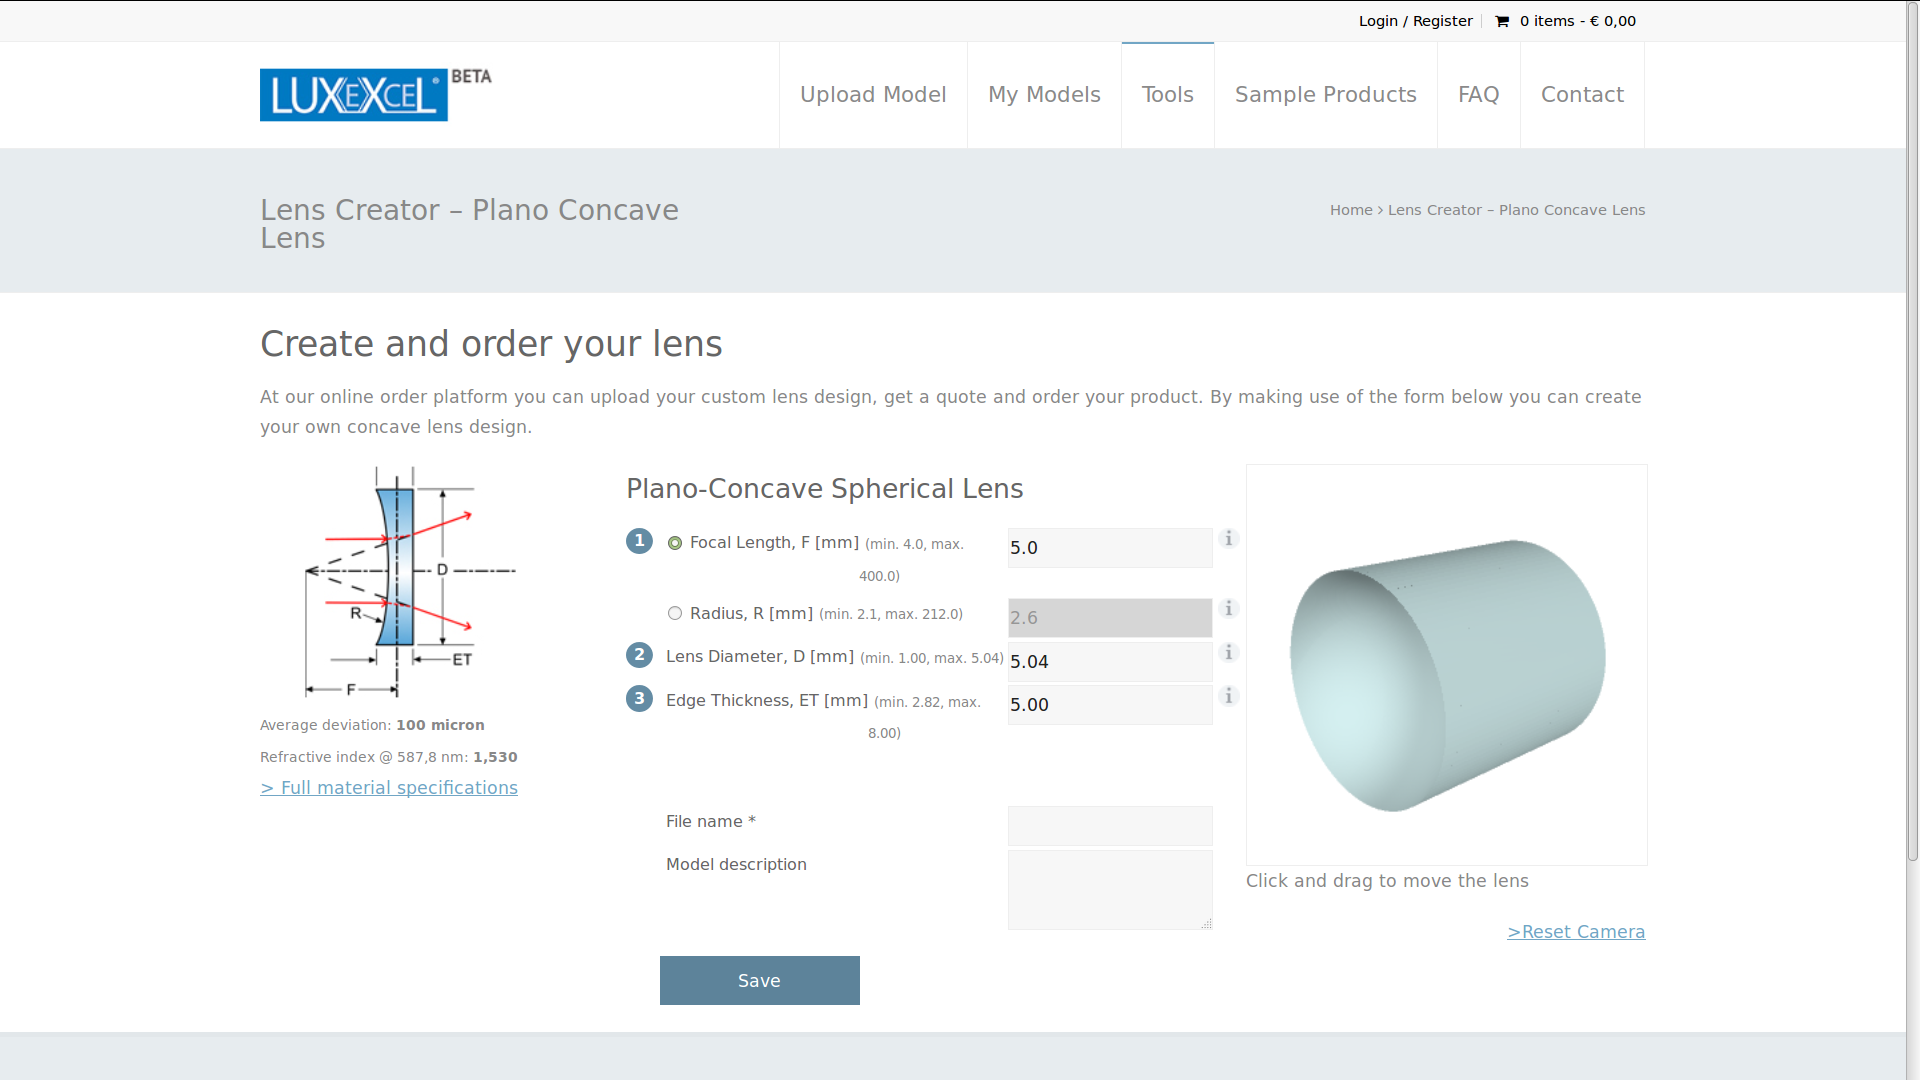 Lens creator - Plano concave lens